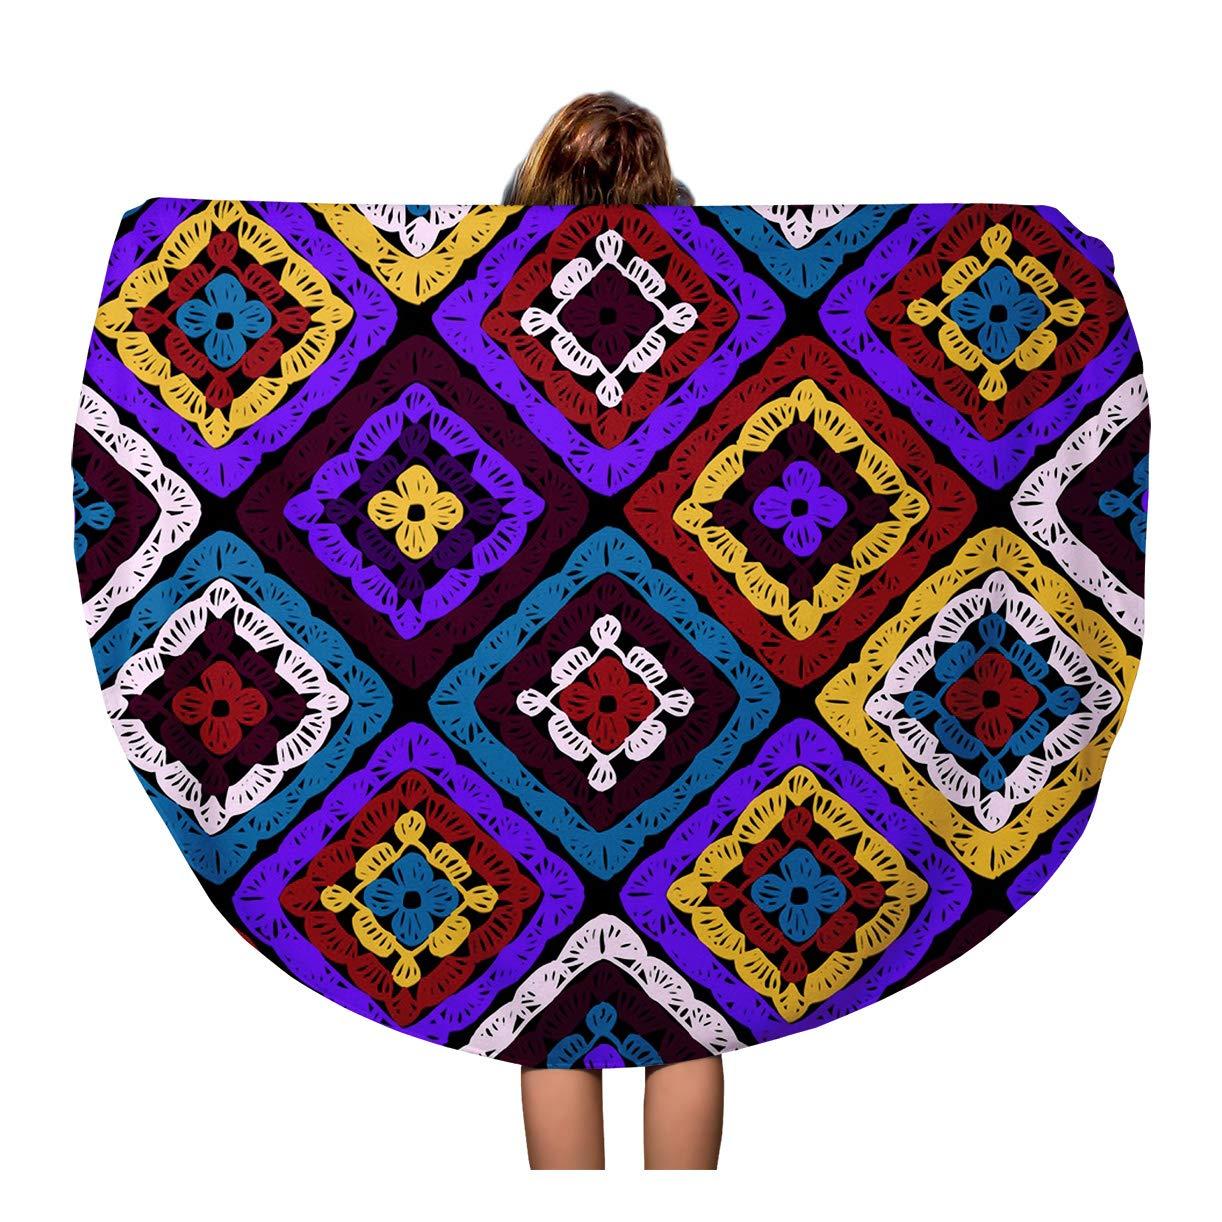 Crochet Round Ripple Blanket   Only New Crochet Patterns